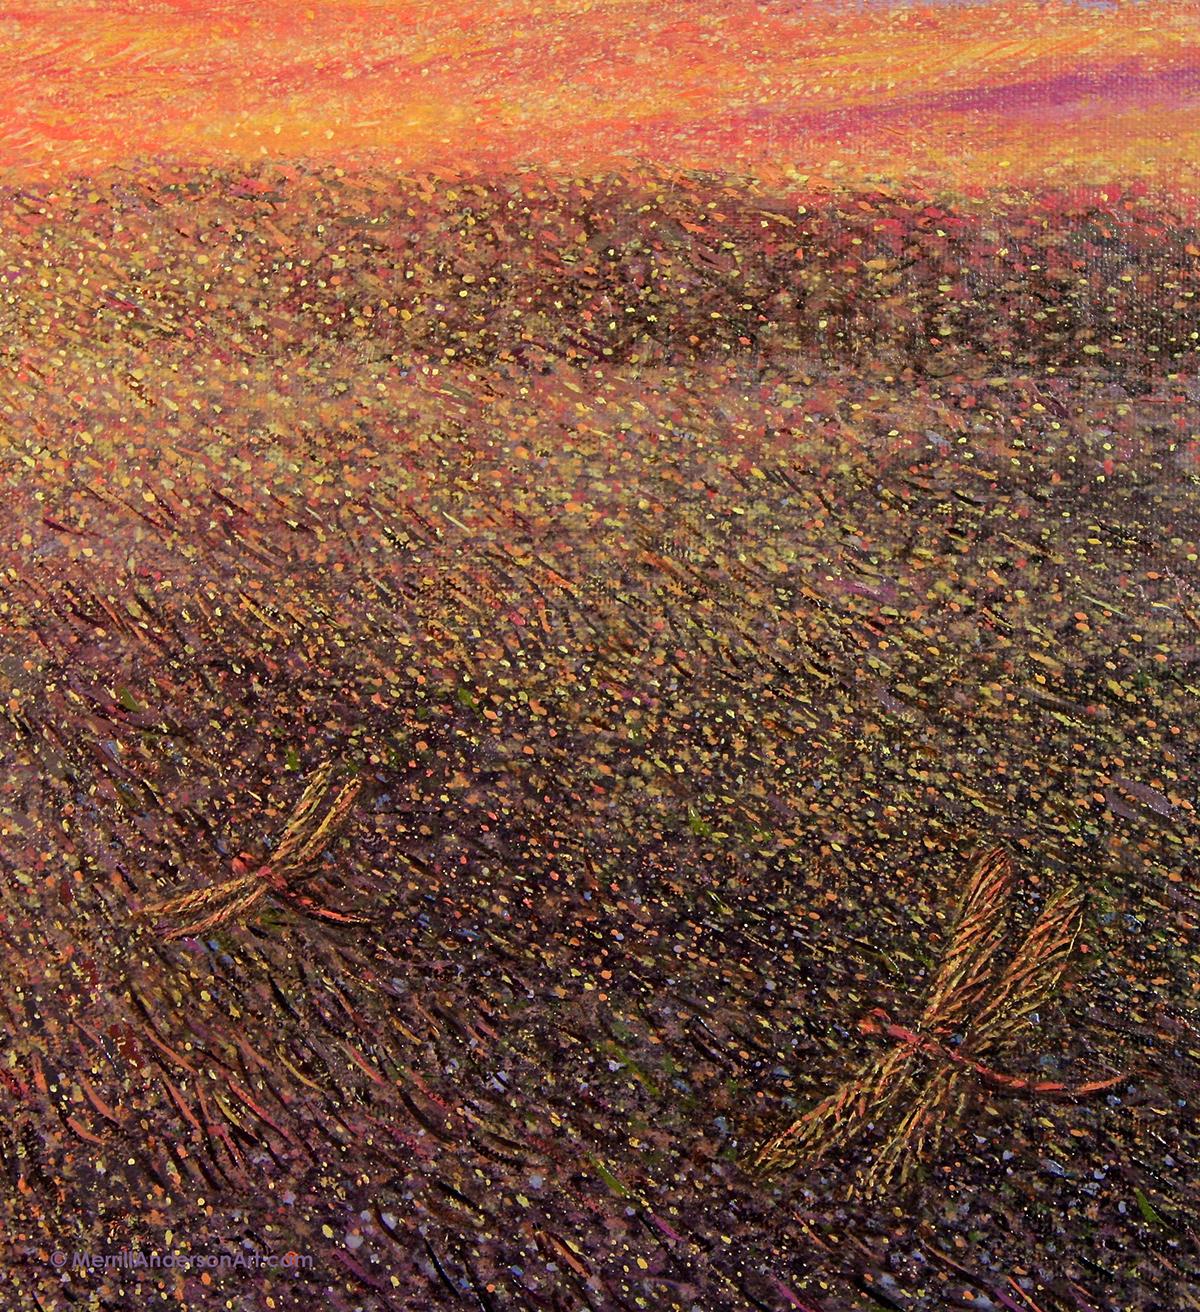 sunset Oil Painting Landscape dragonflies ethereal fine art SKY